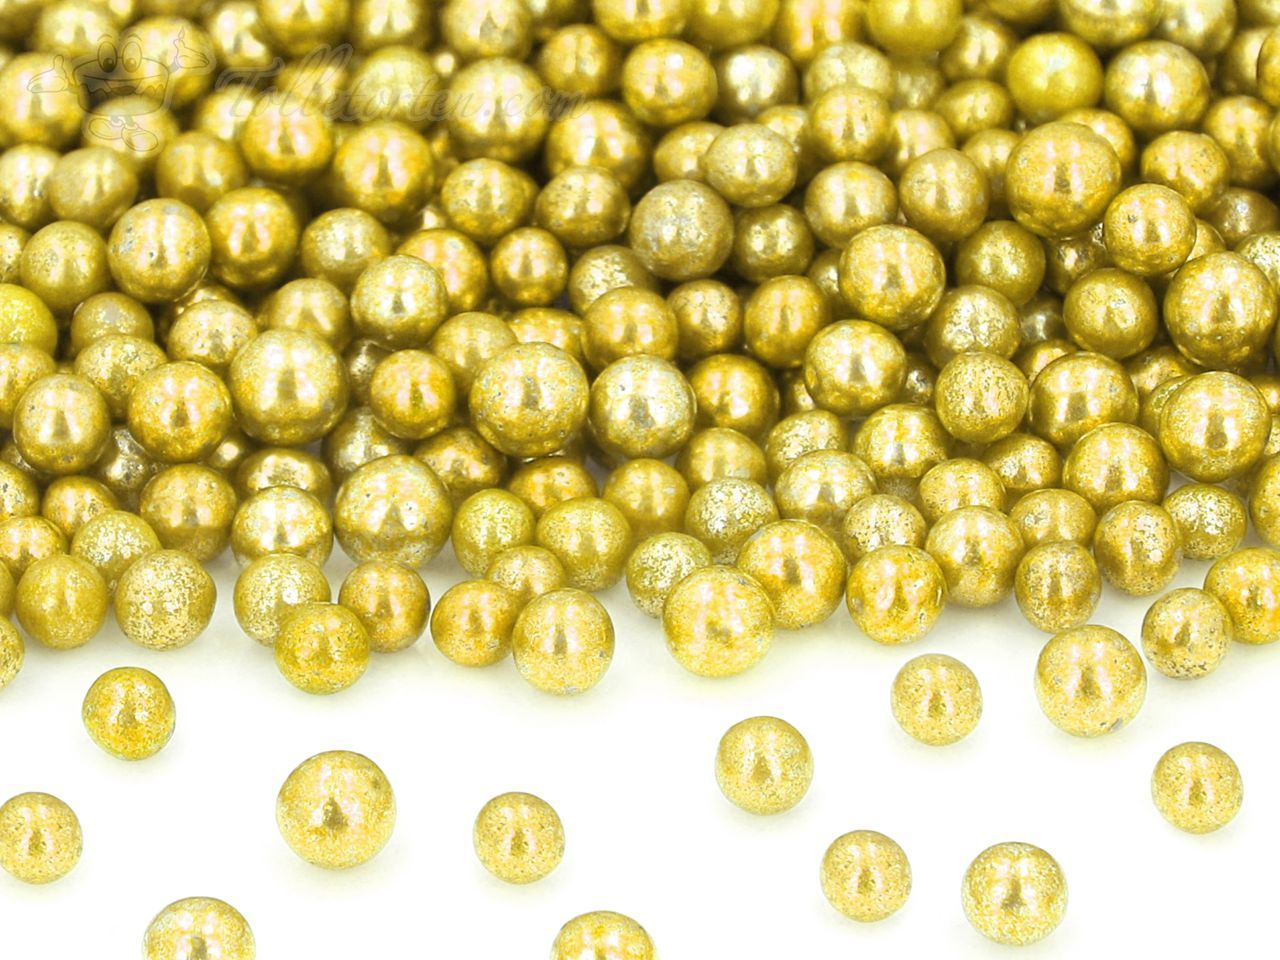 goldperlen gro zucker 50g perlen tolletorten. Black Bedroom Furniture Sets. Home Design Ideas